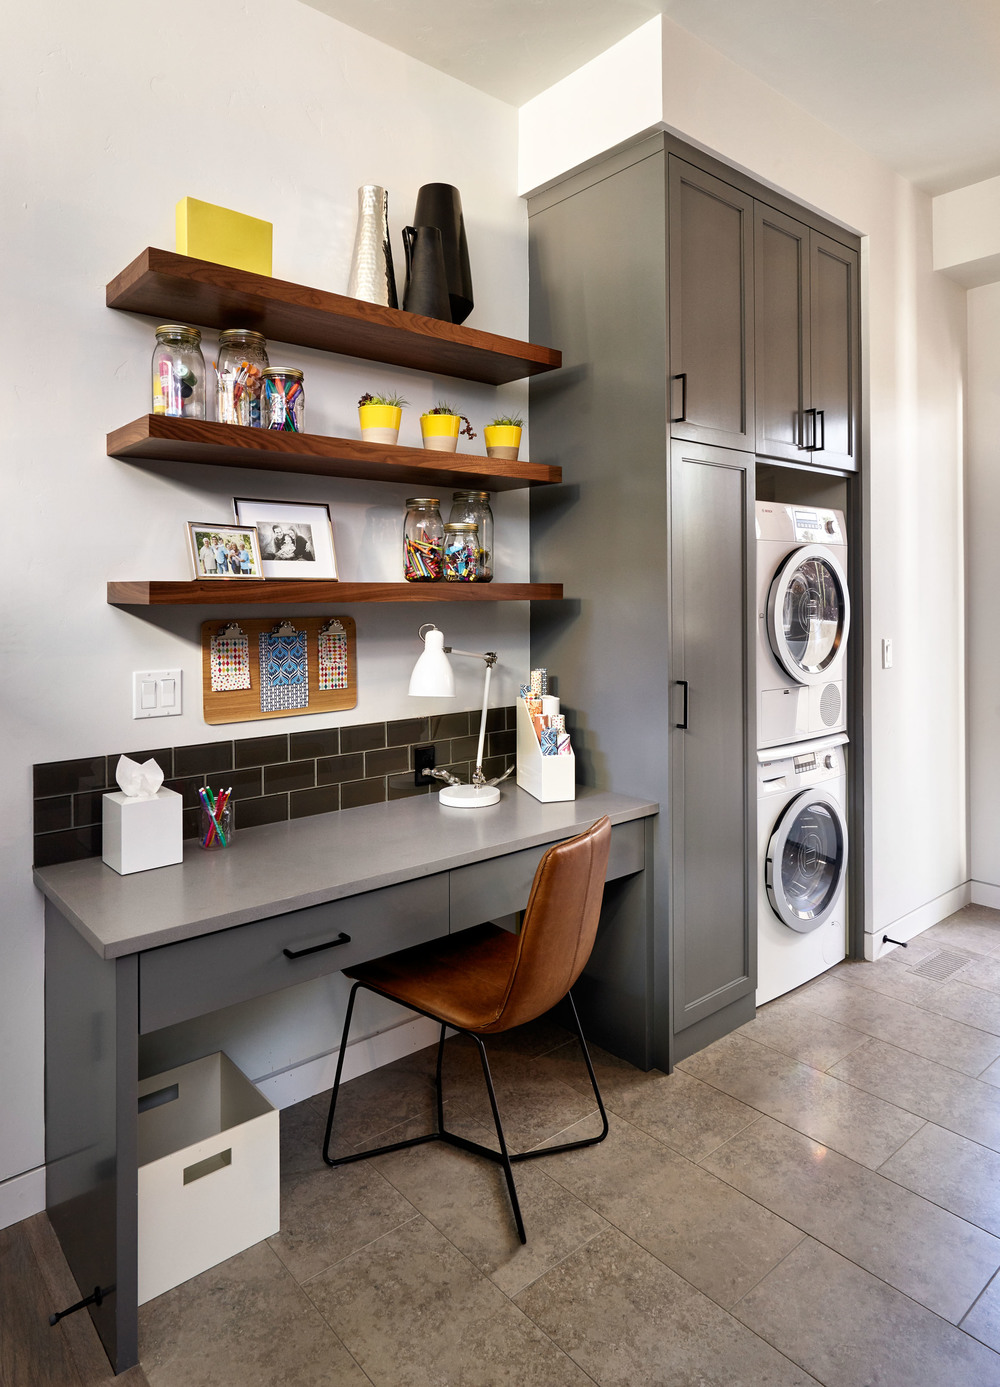 Sandhill Crane Laundry Room